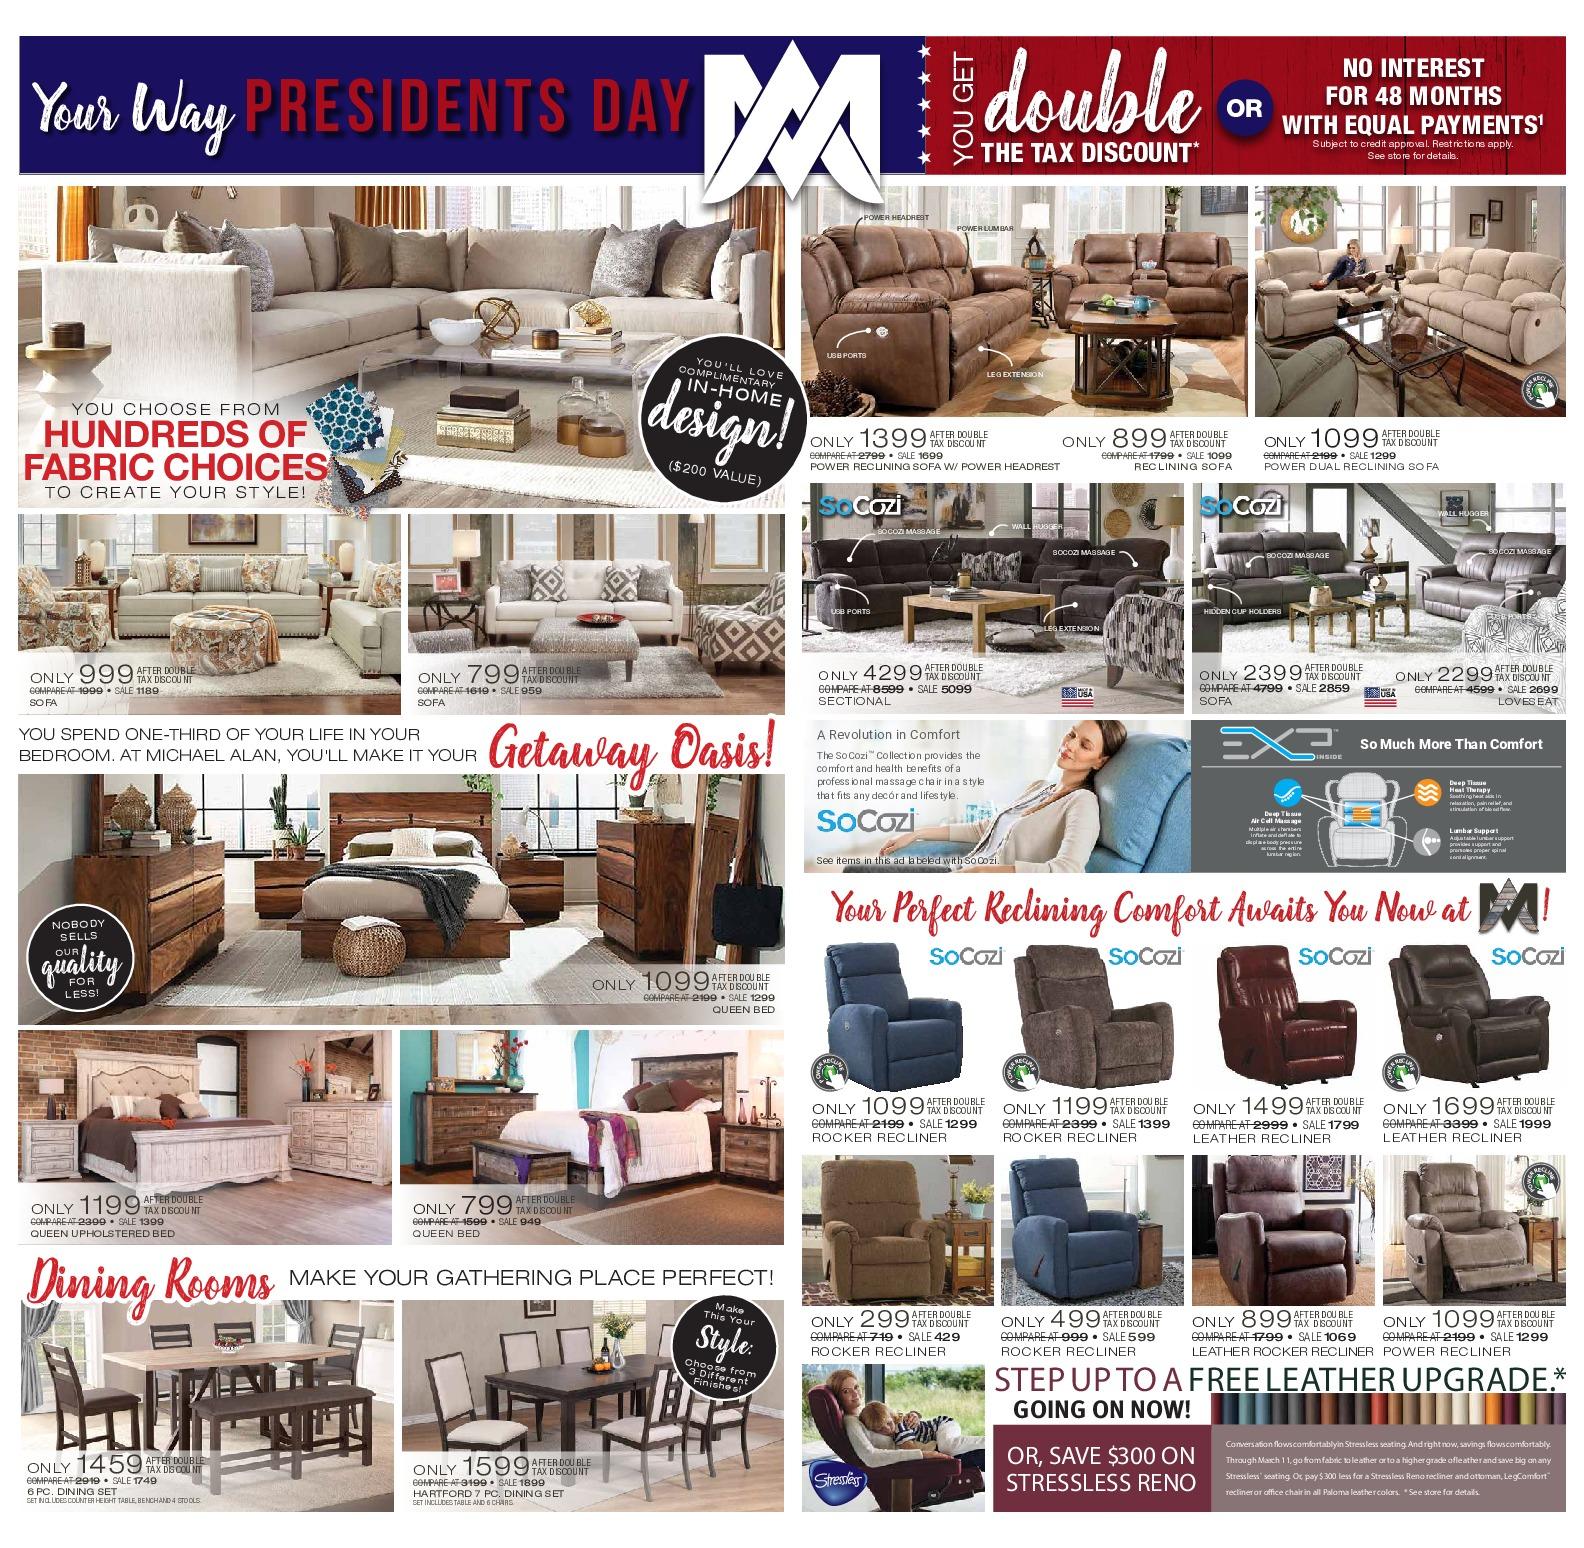 MIAL-9021-1911-PresidentsDay-SPECIALS